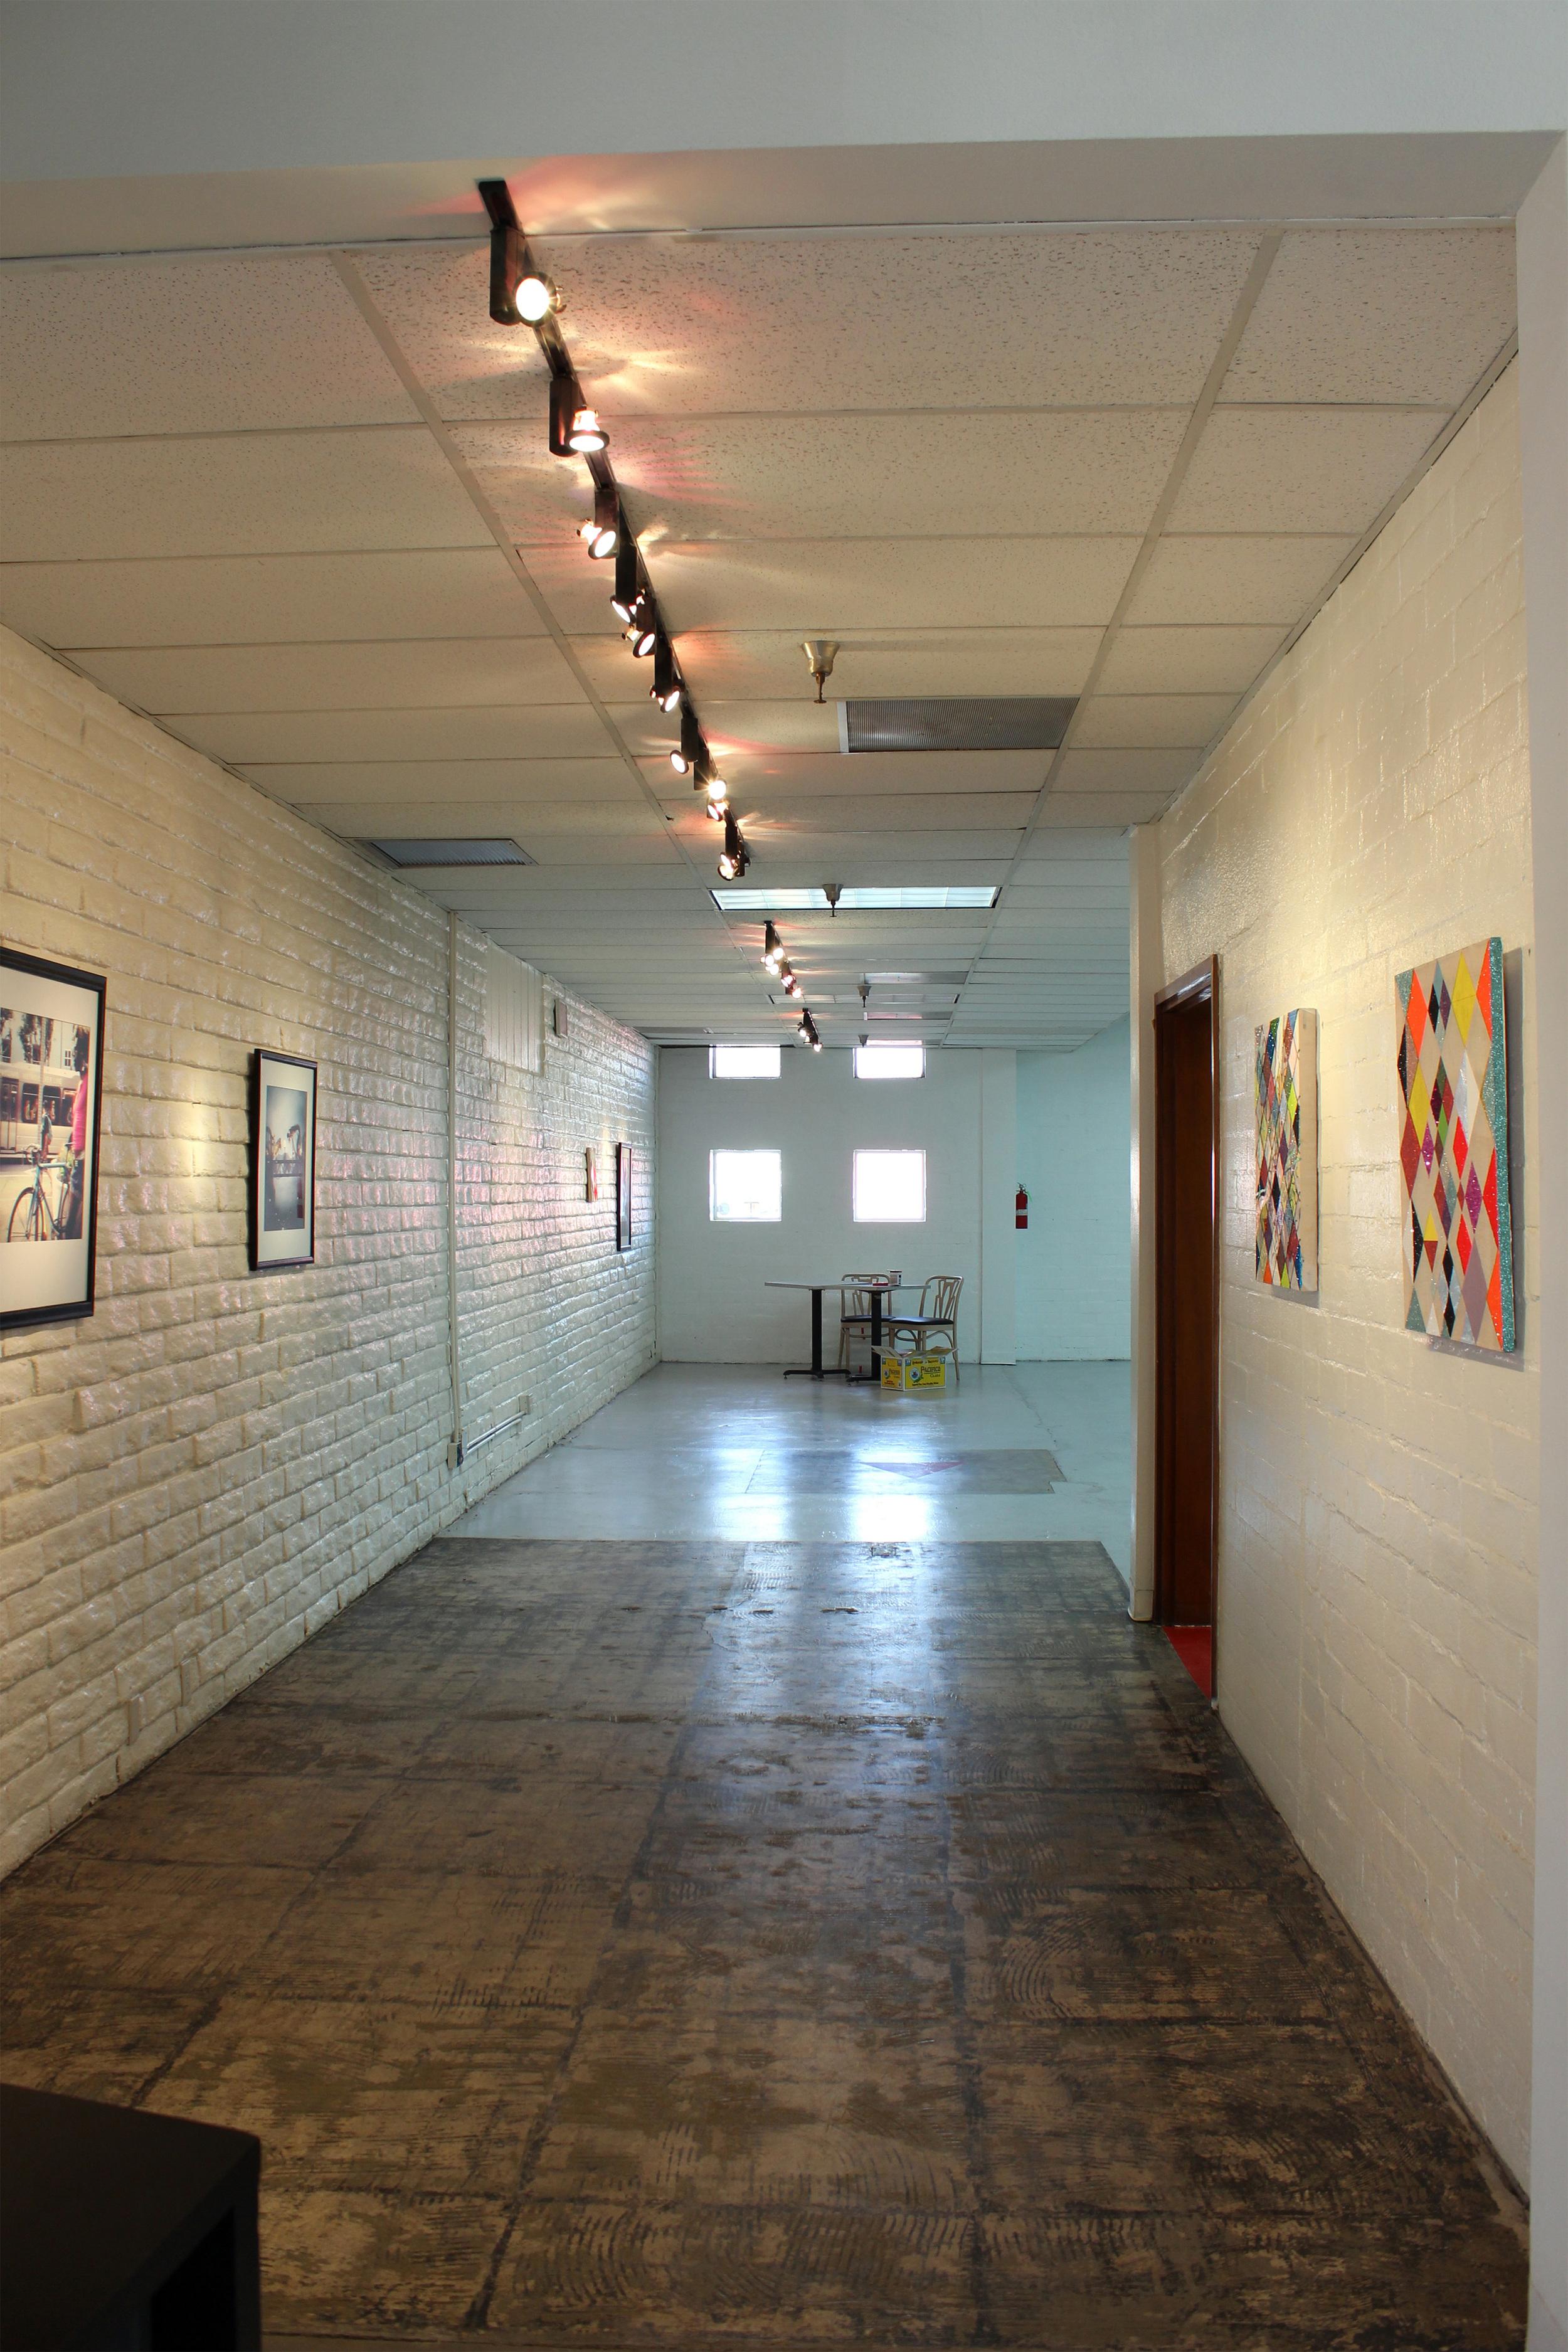 Main Gallery Entrance